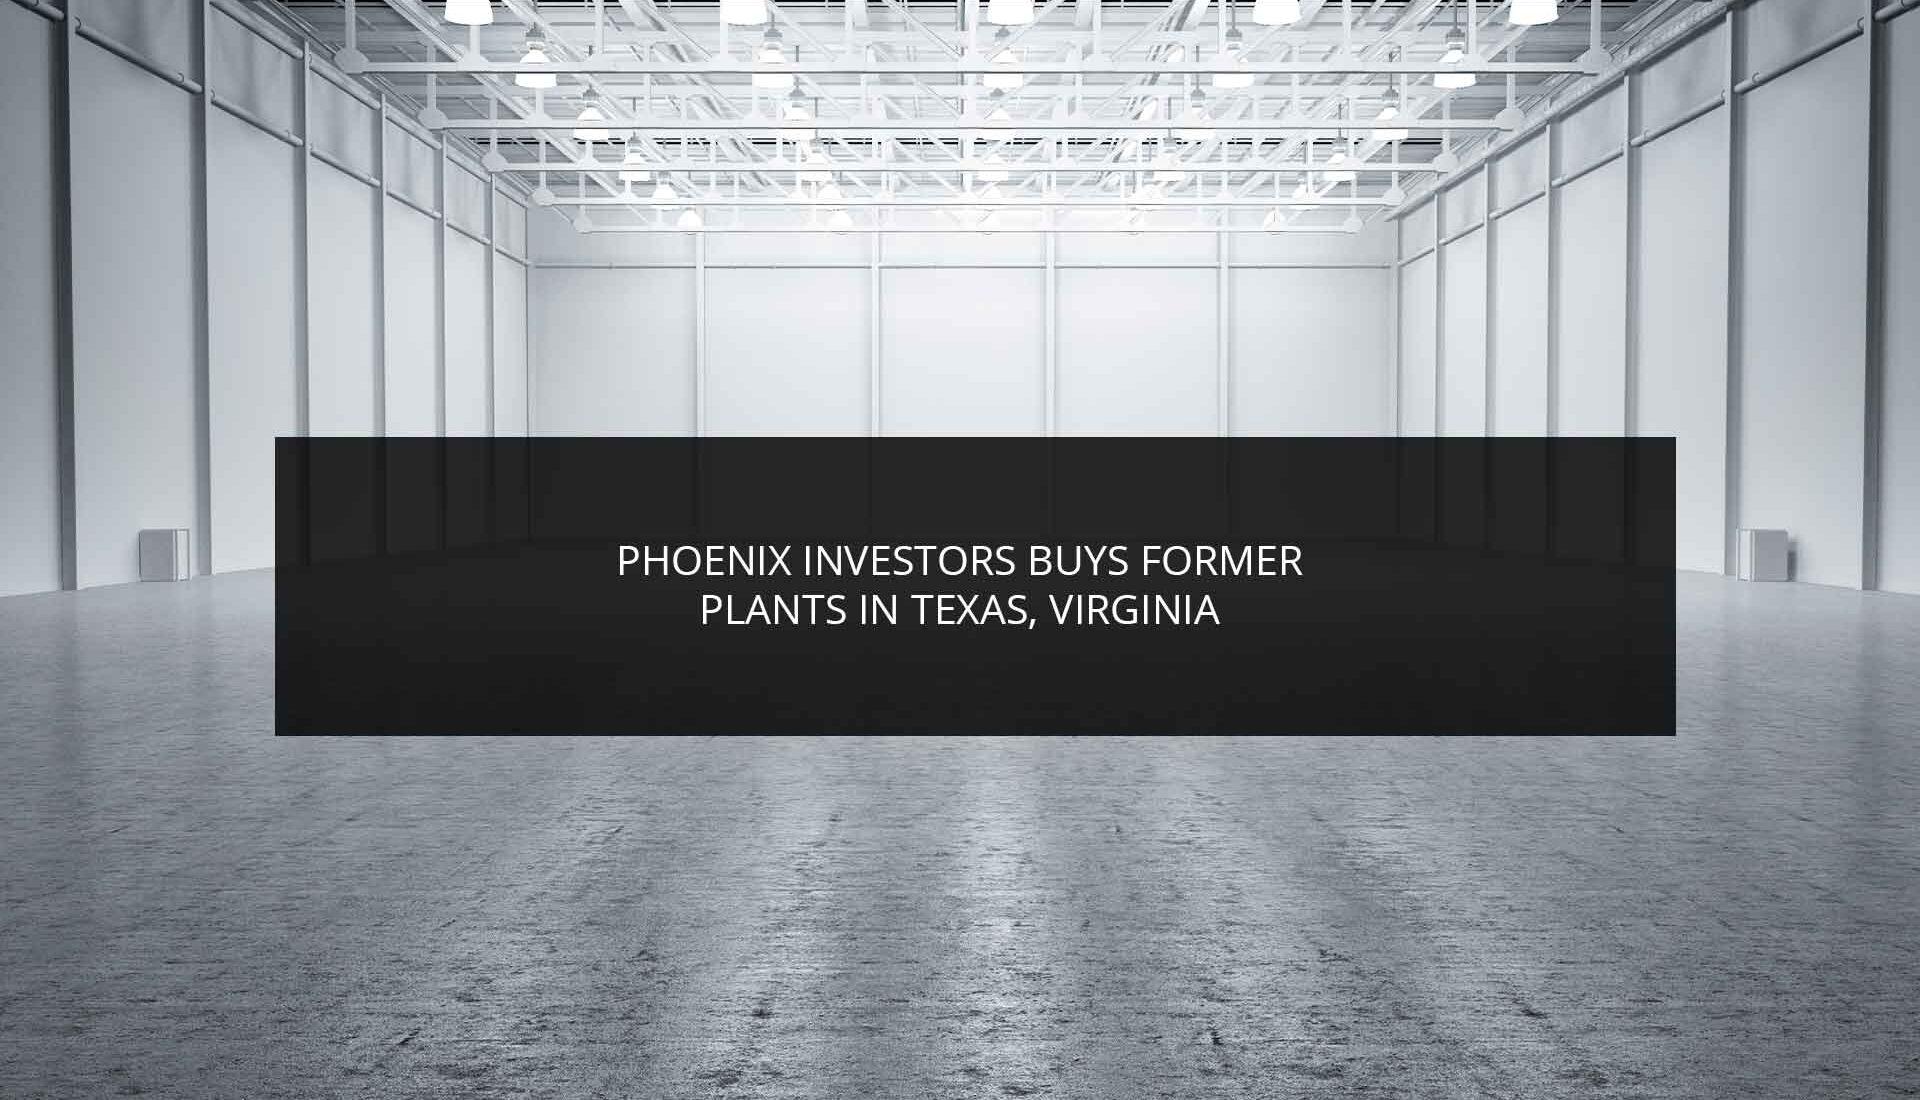 Phoenix Investors Buys Former Plants in Texas Virginia